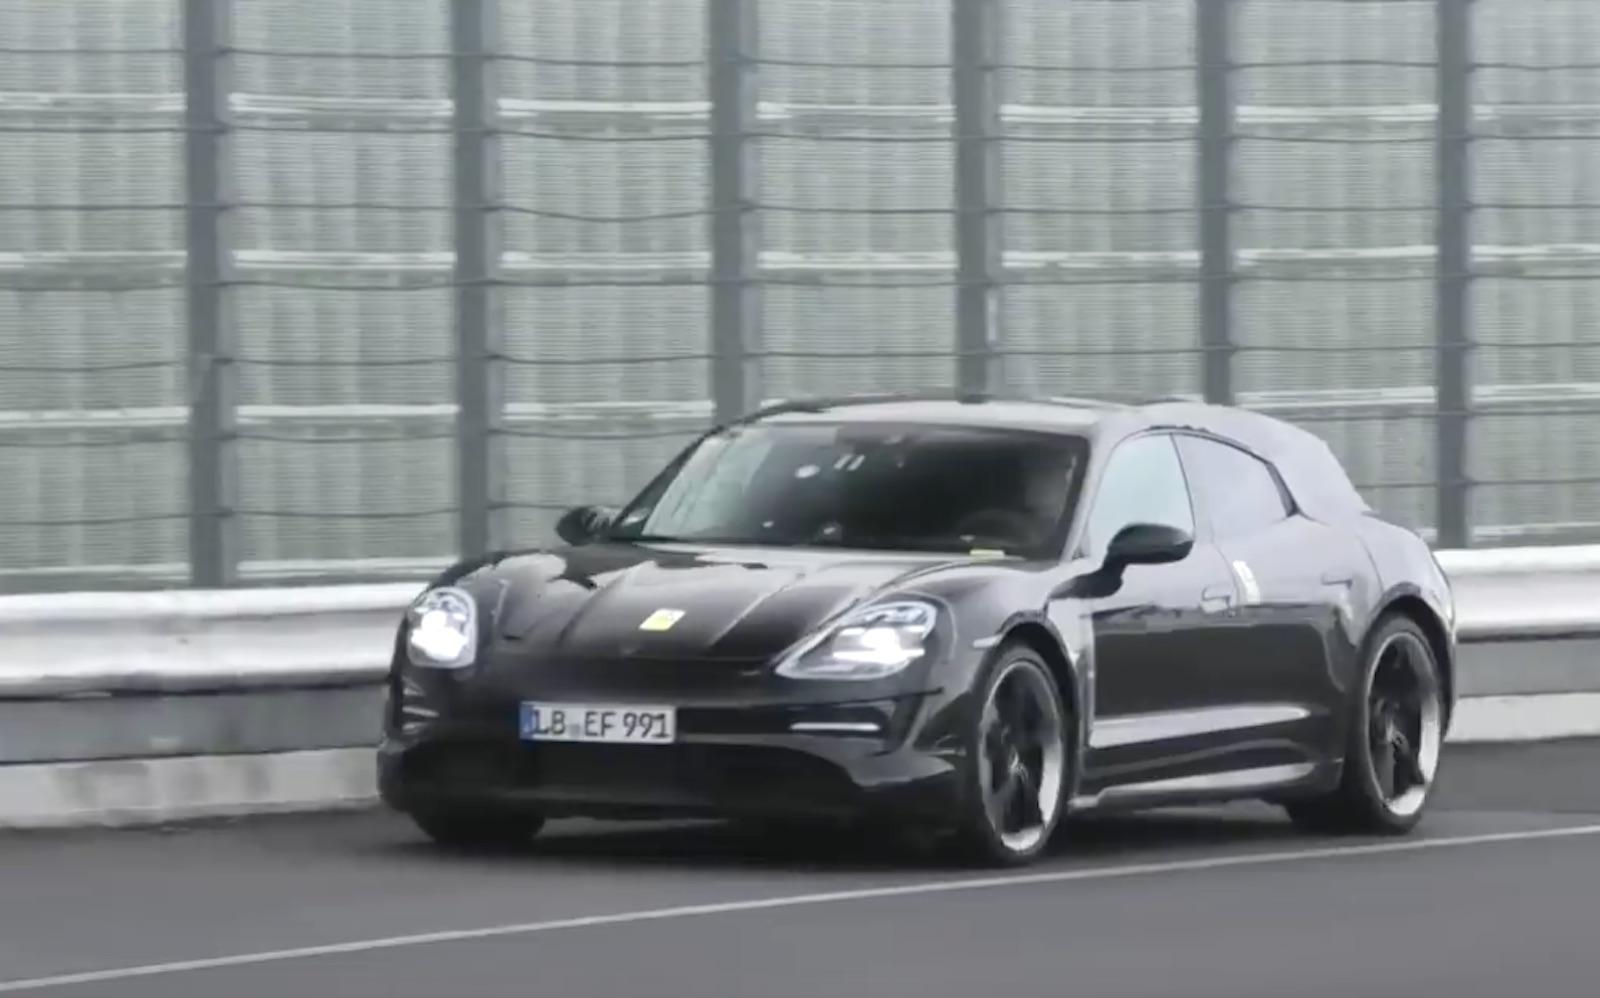 Porsche Taycan Crossturismo Prototipo Frontal